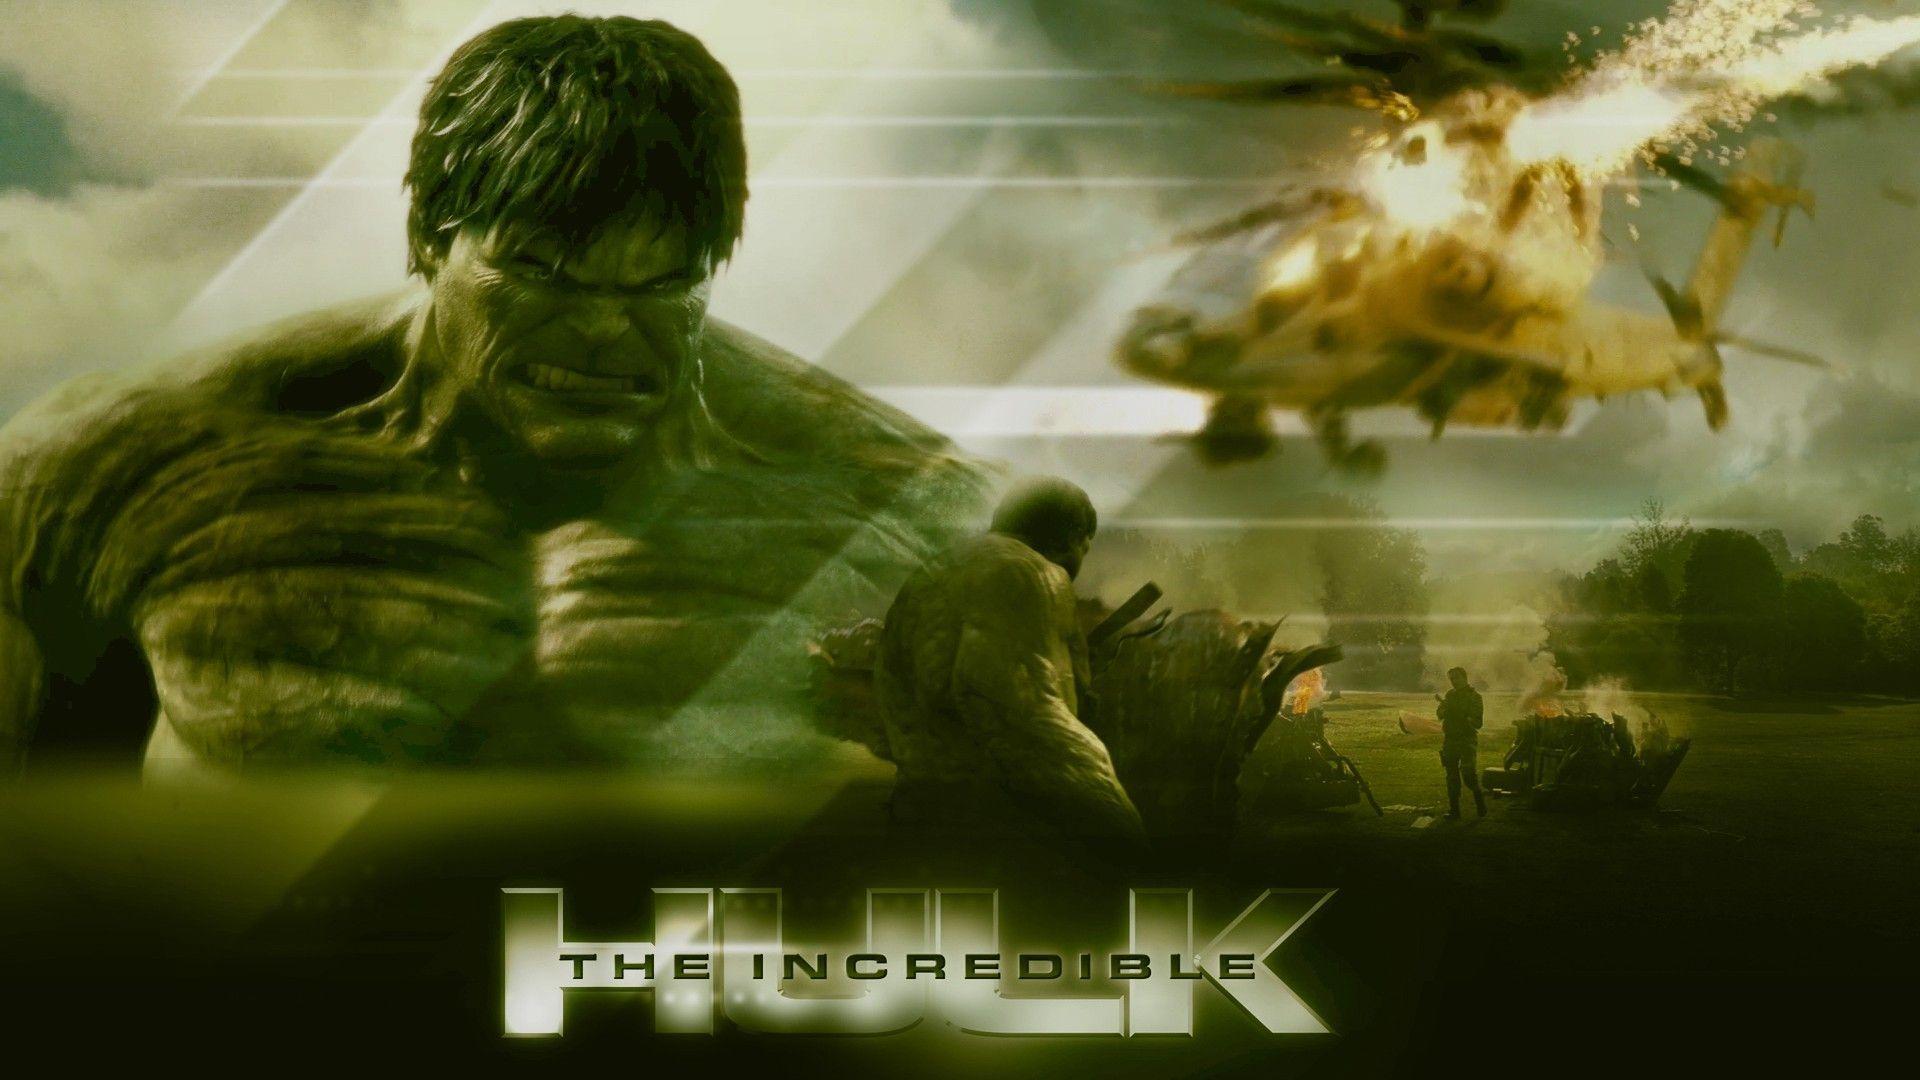 20 The Incredible Hulk Wallpapers | The Incredible Hulk Backgrounds